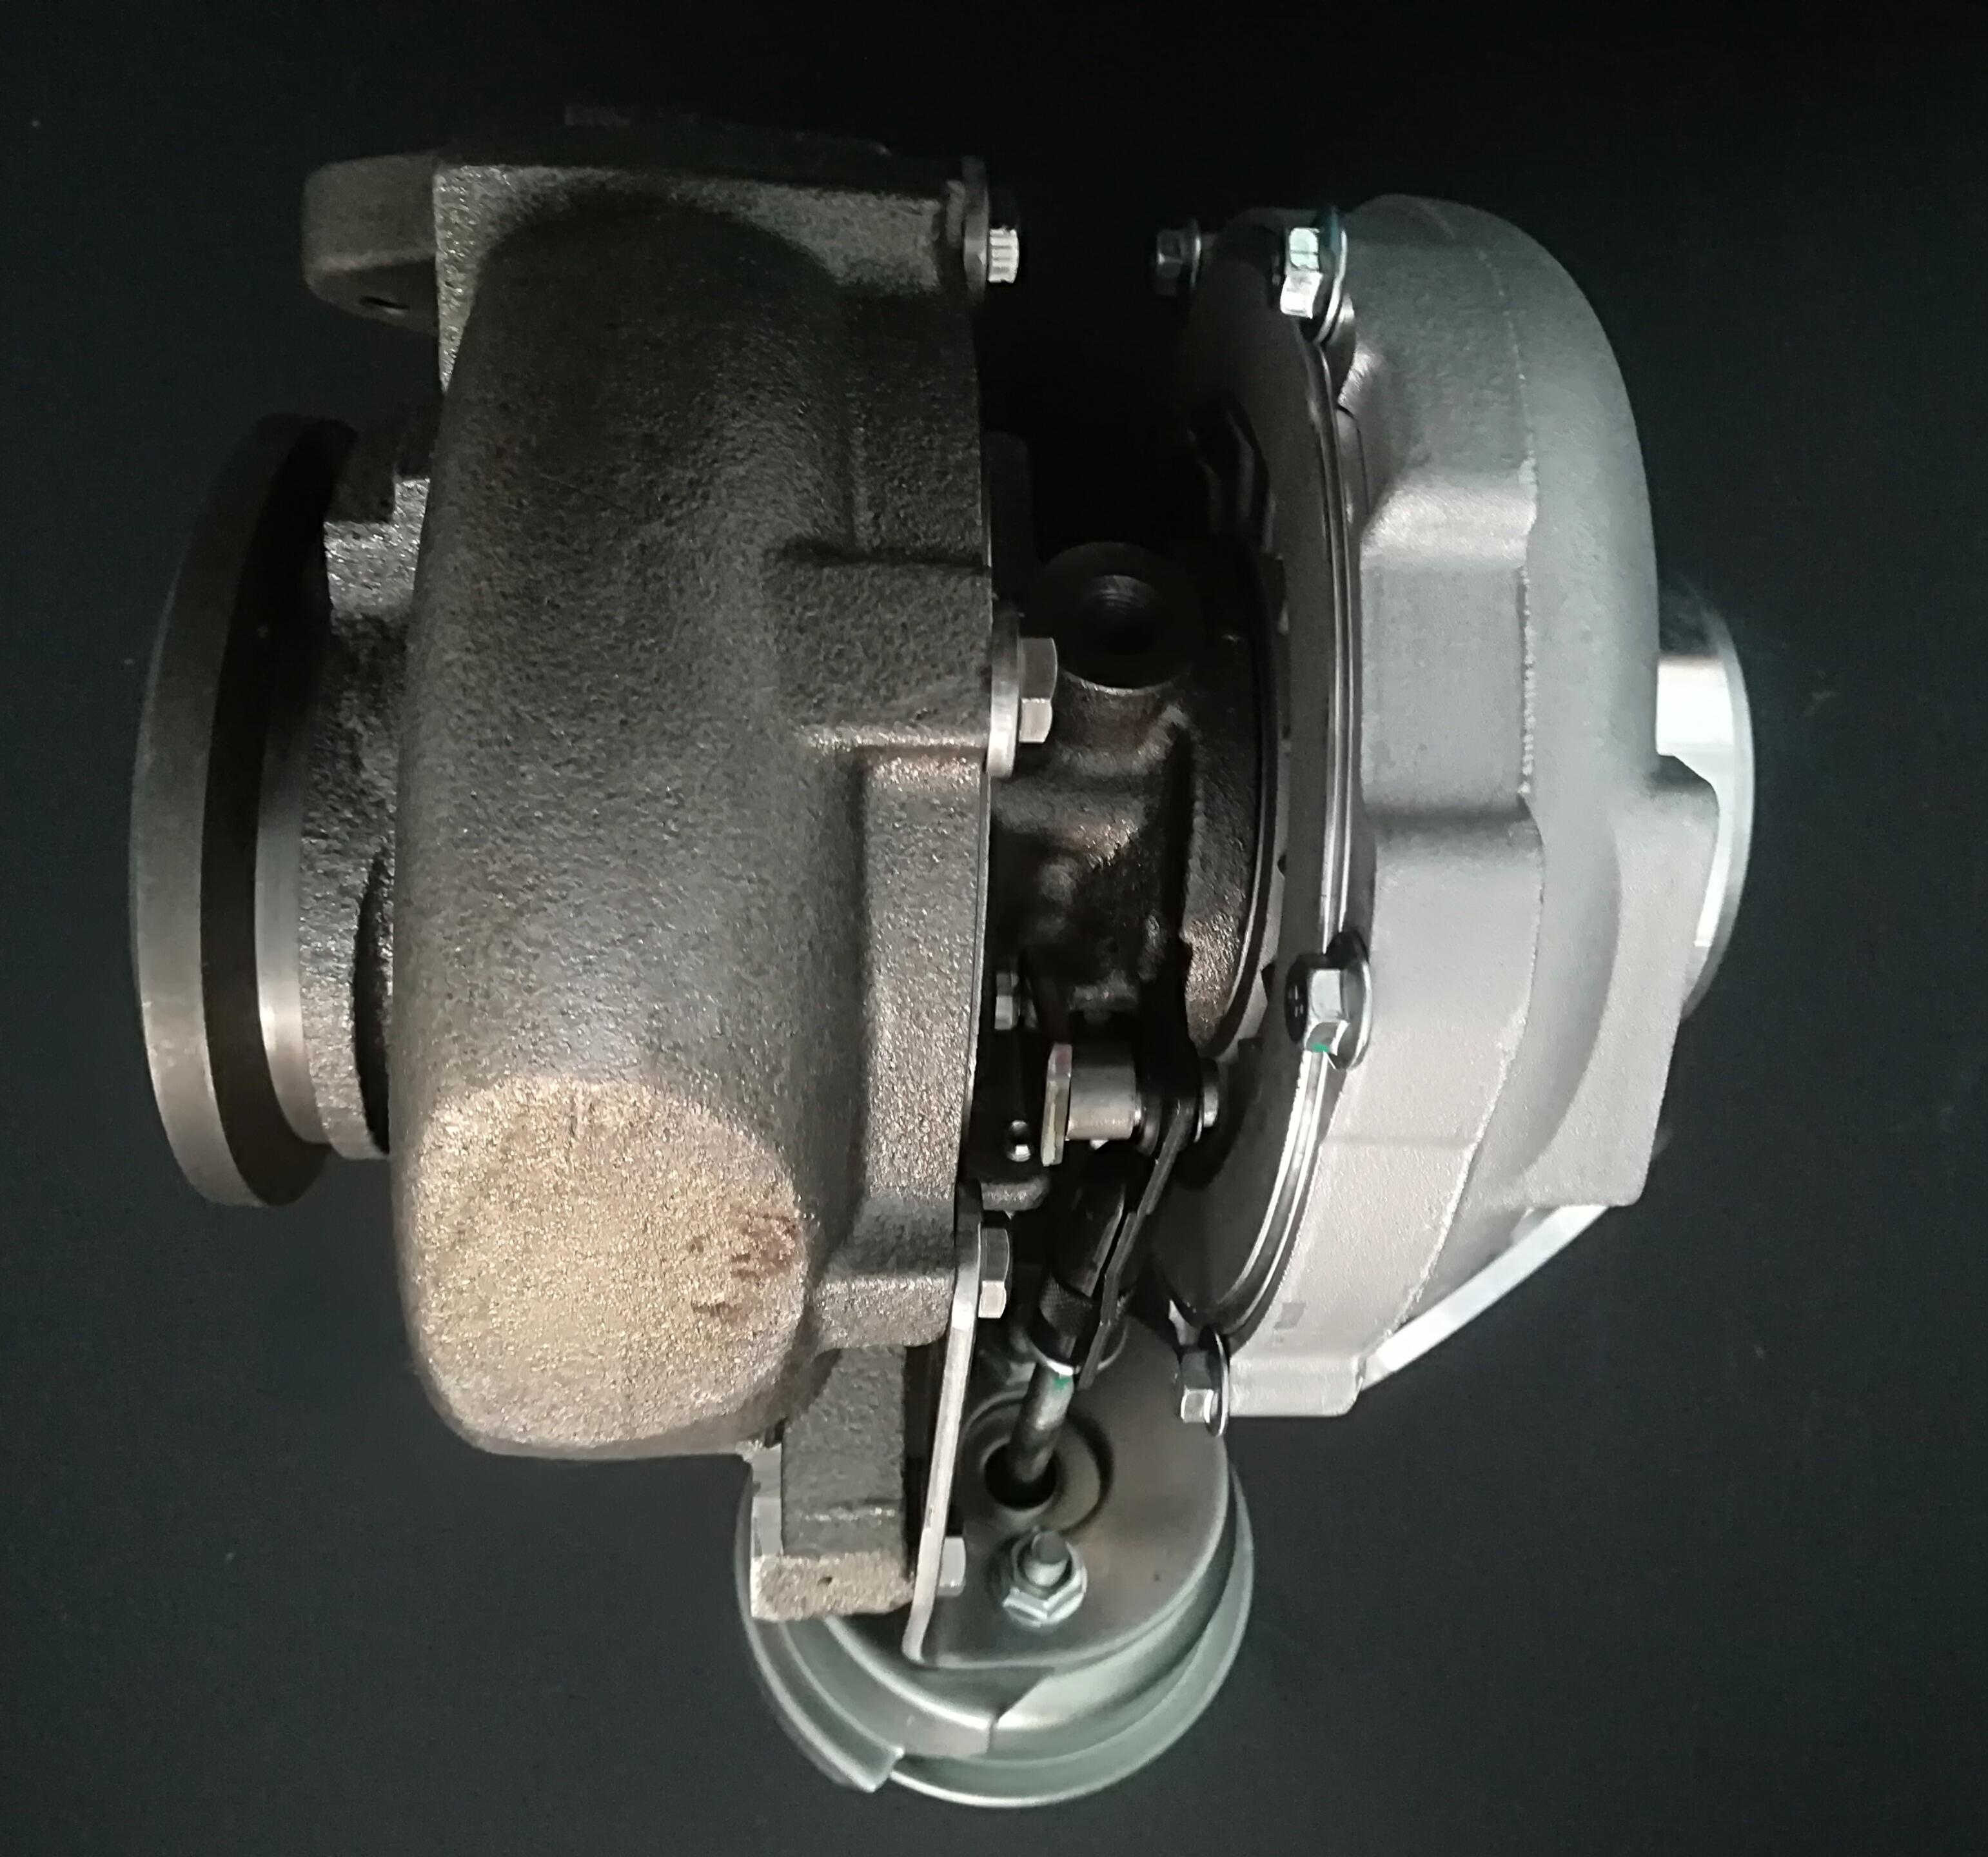 GT2256V Turbocharger 709838-5005 A6120960399 turbo for MercedesBenz with engine OM612 DE/OM612 D5S